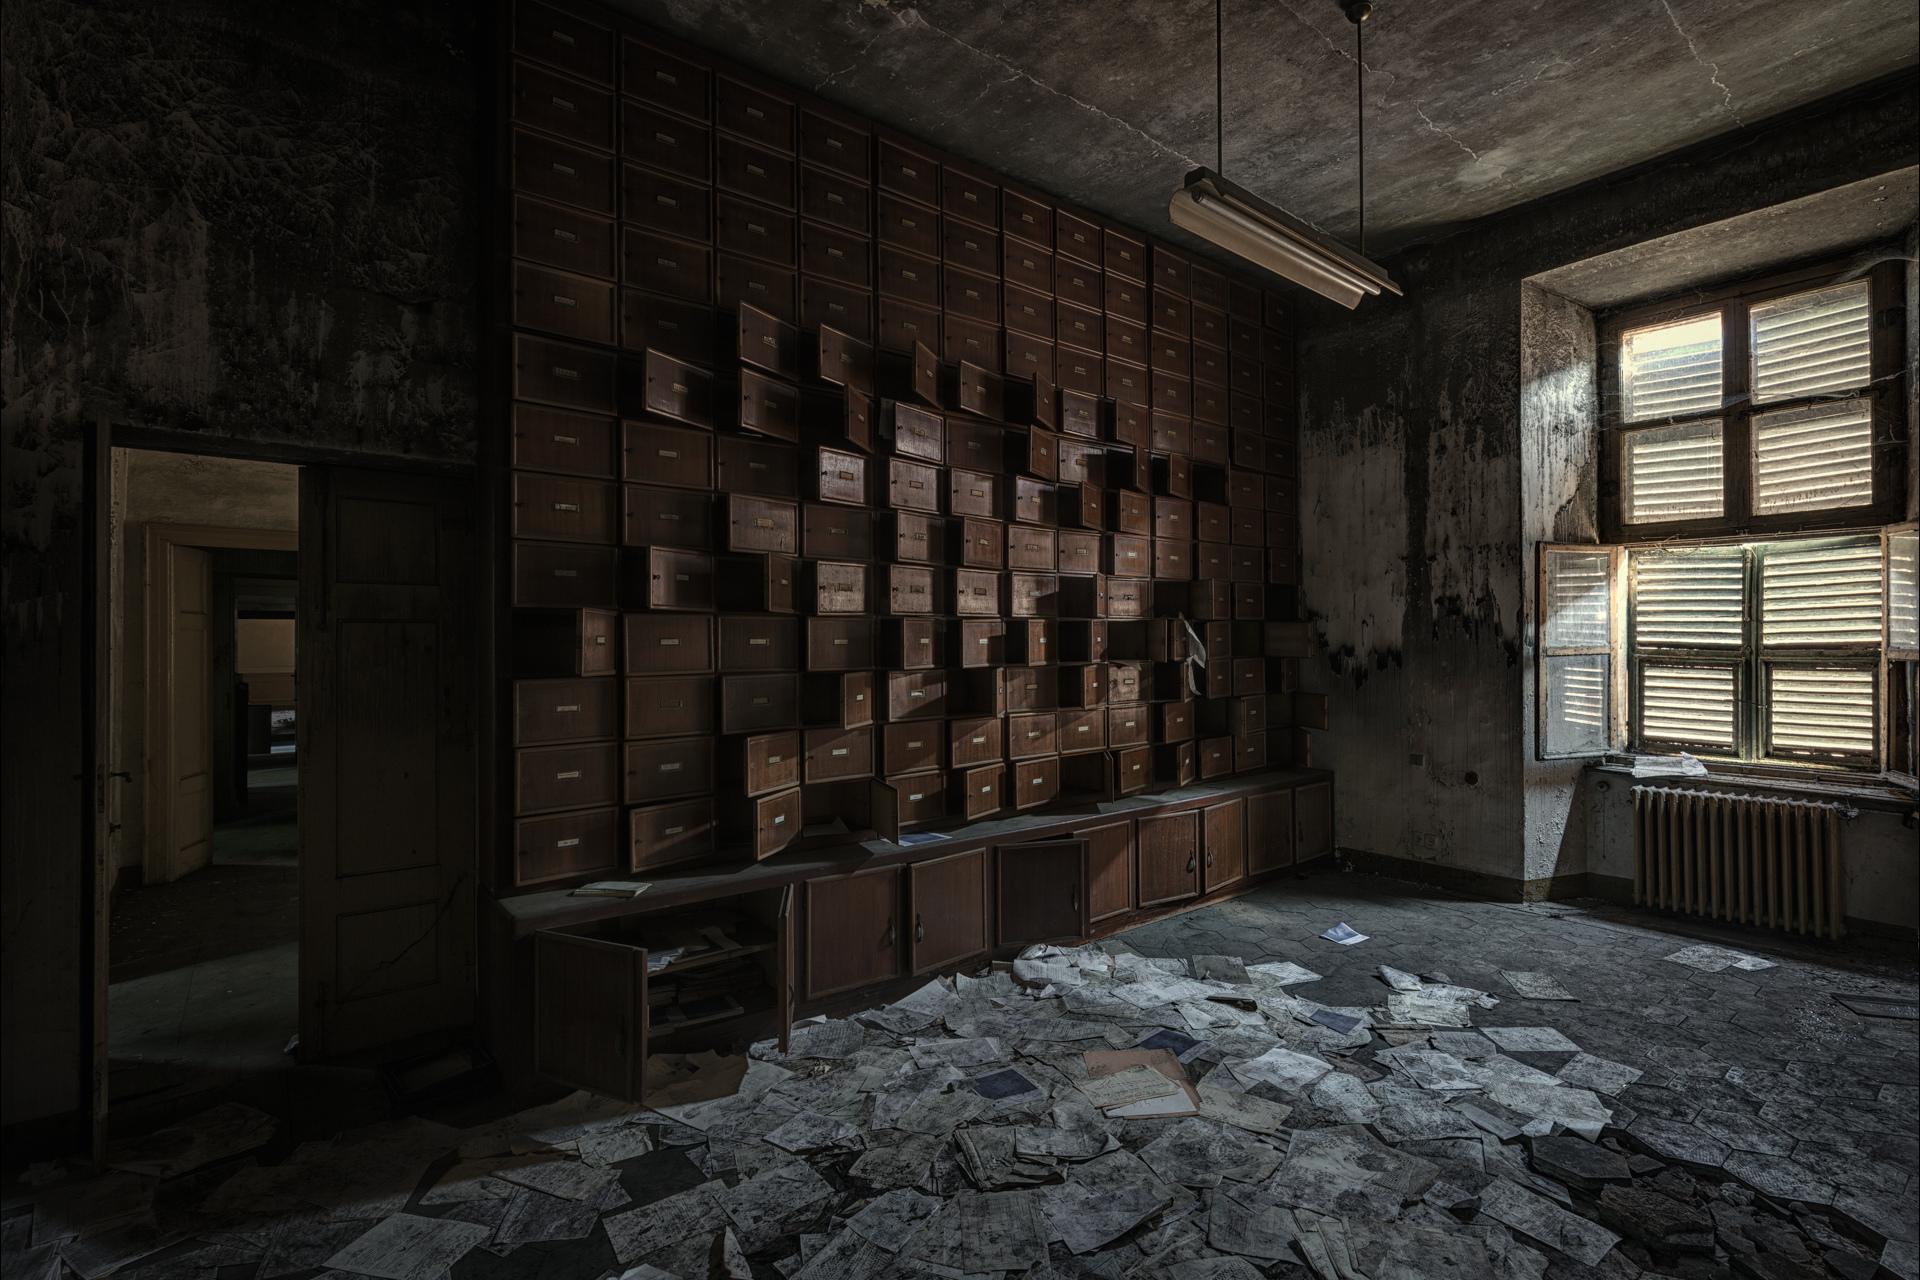 Urban Exploration - Manicomio Dr. Rossetti - File System